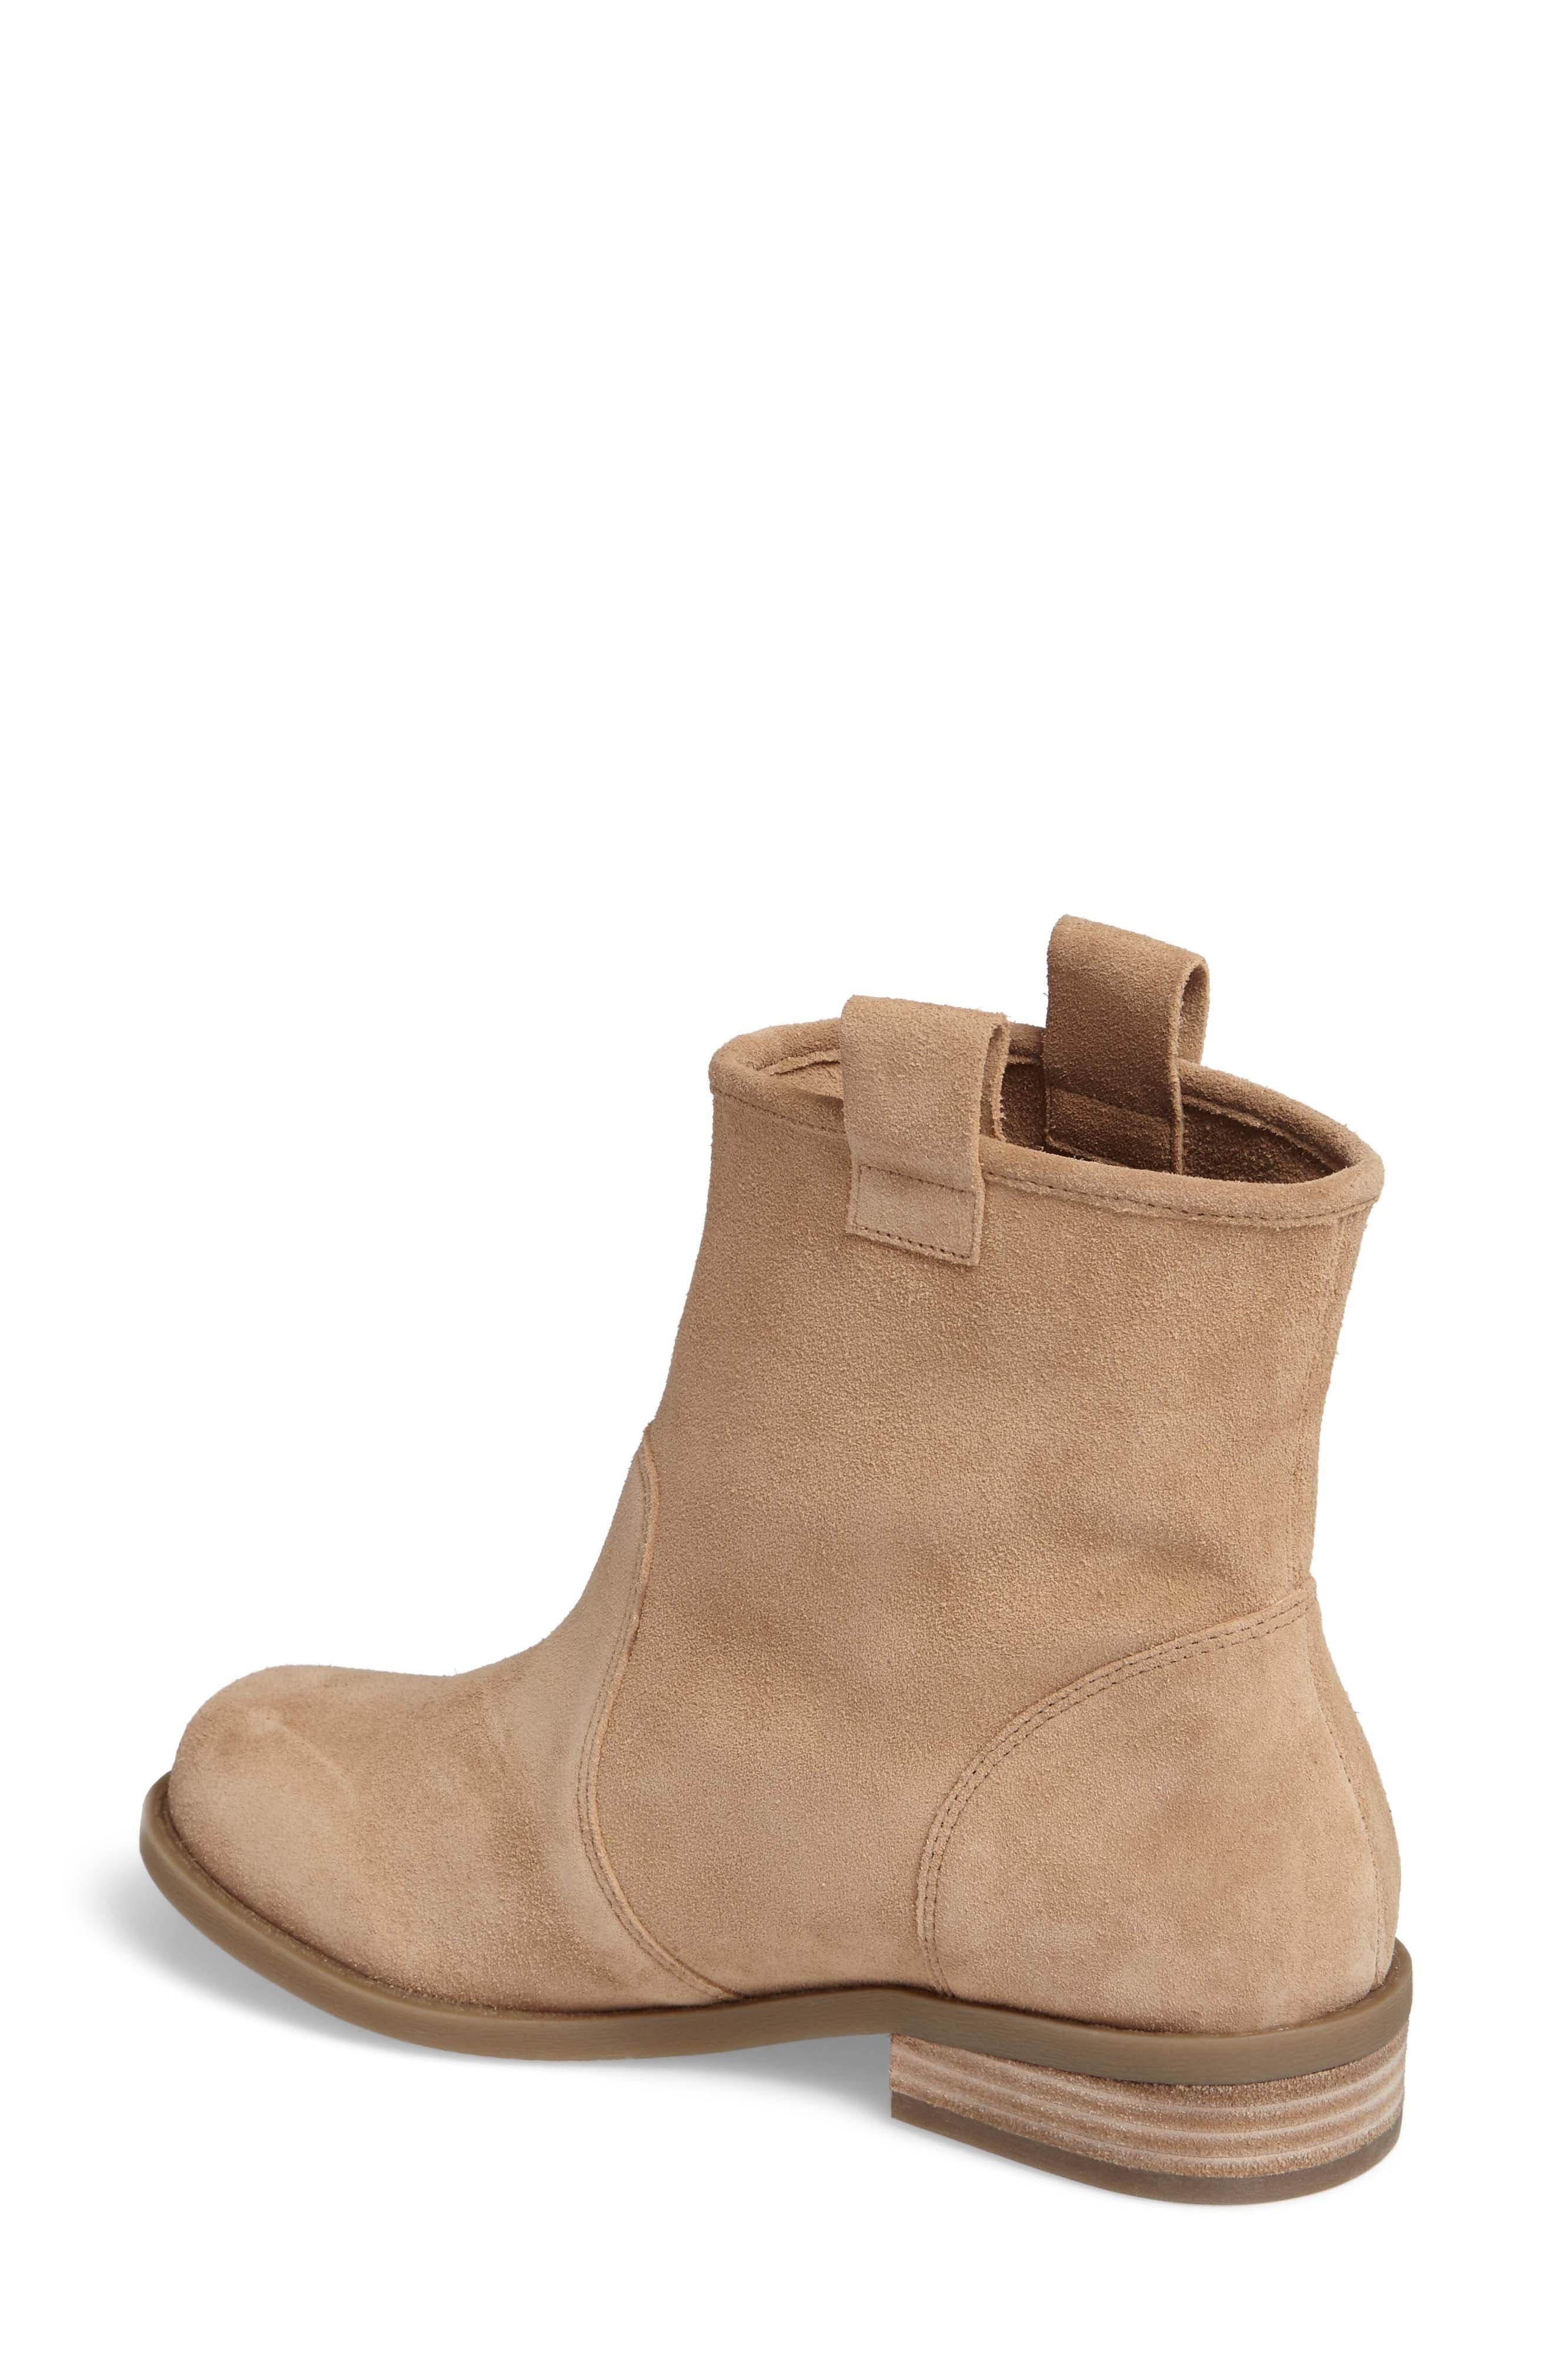 Alternate Image 2  - Sole Society 'Natasha' Boot (Women)